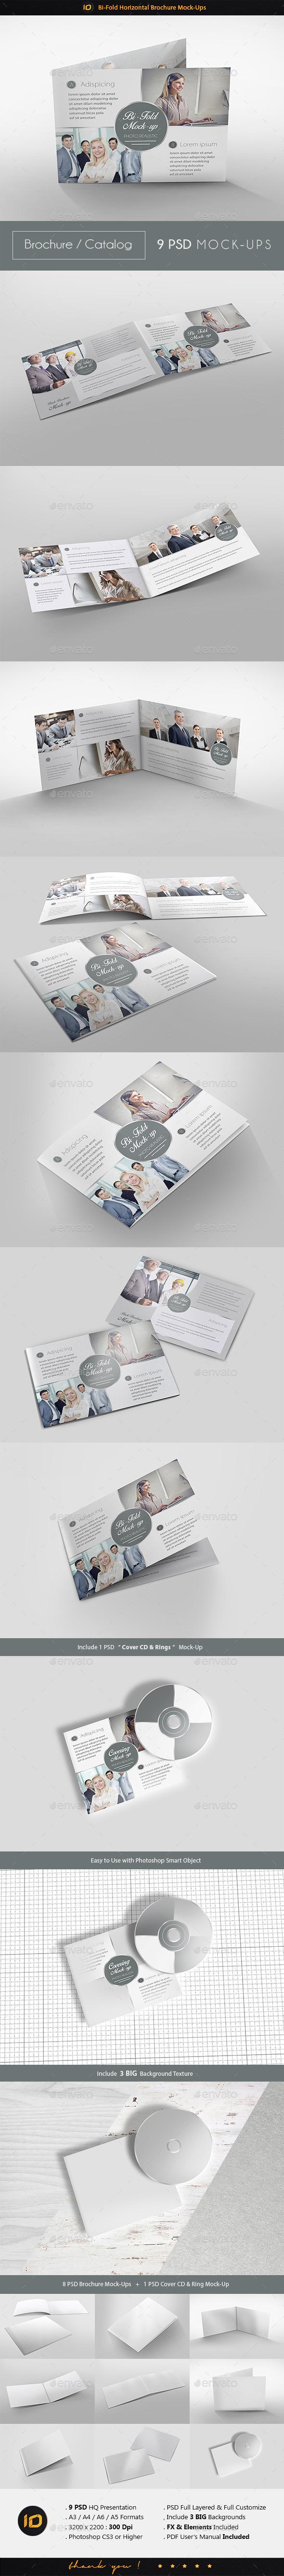 Bi-Fold Horizontal Brochure Mock-Up - Brochures Print